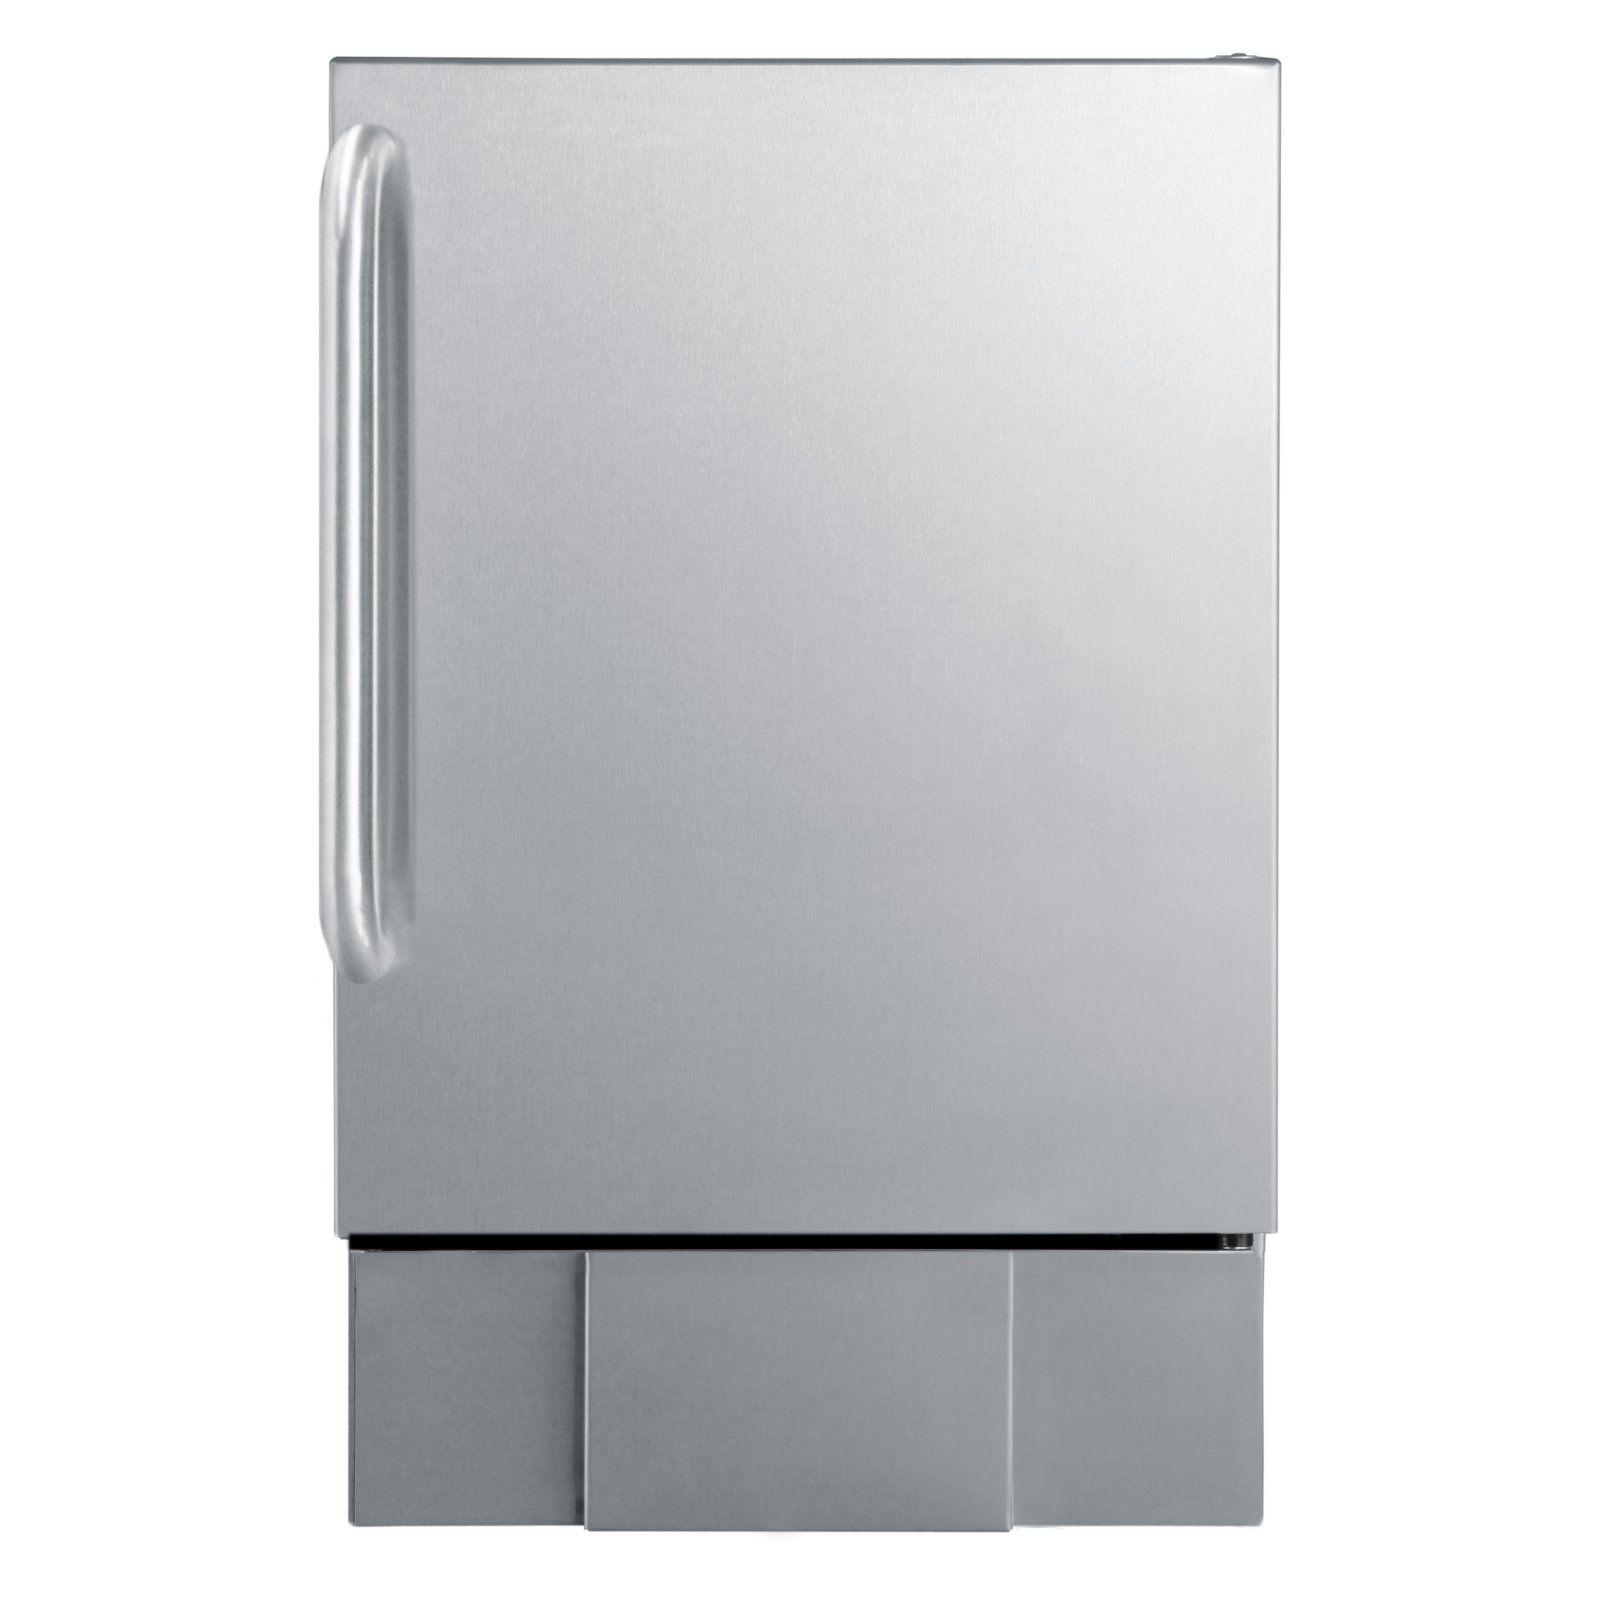 Summit Bim240s Under Counter Ice Maker Ice Maker Outdoor Kitchen Appliances Stainless Steel Cabinets